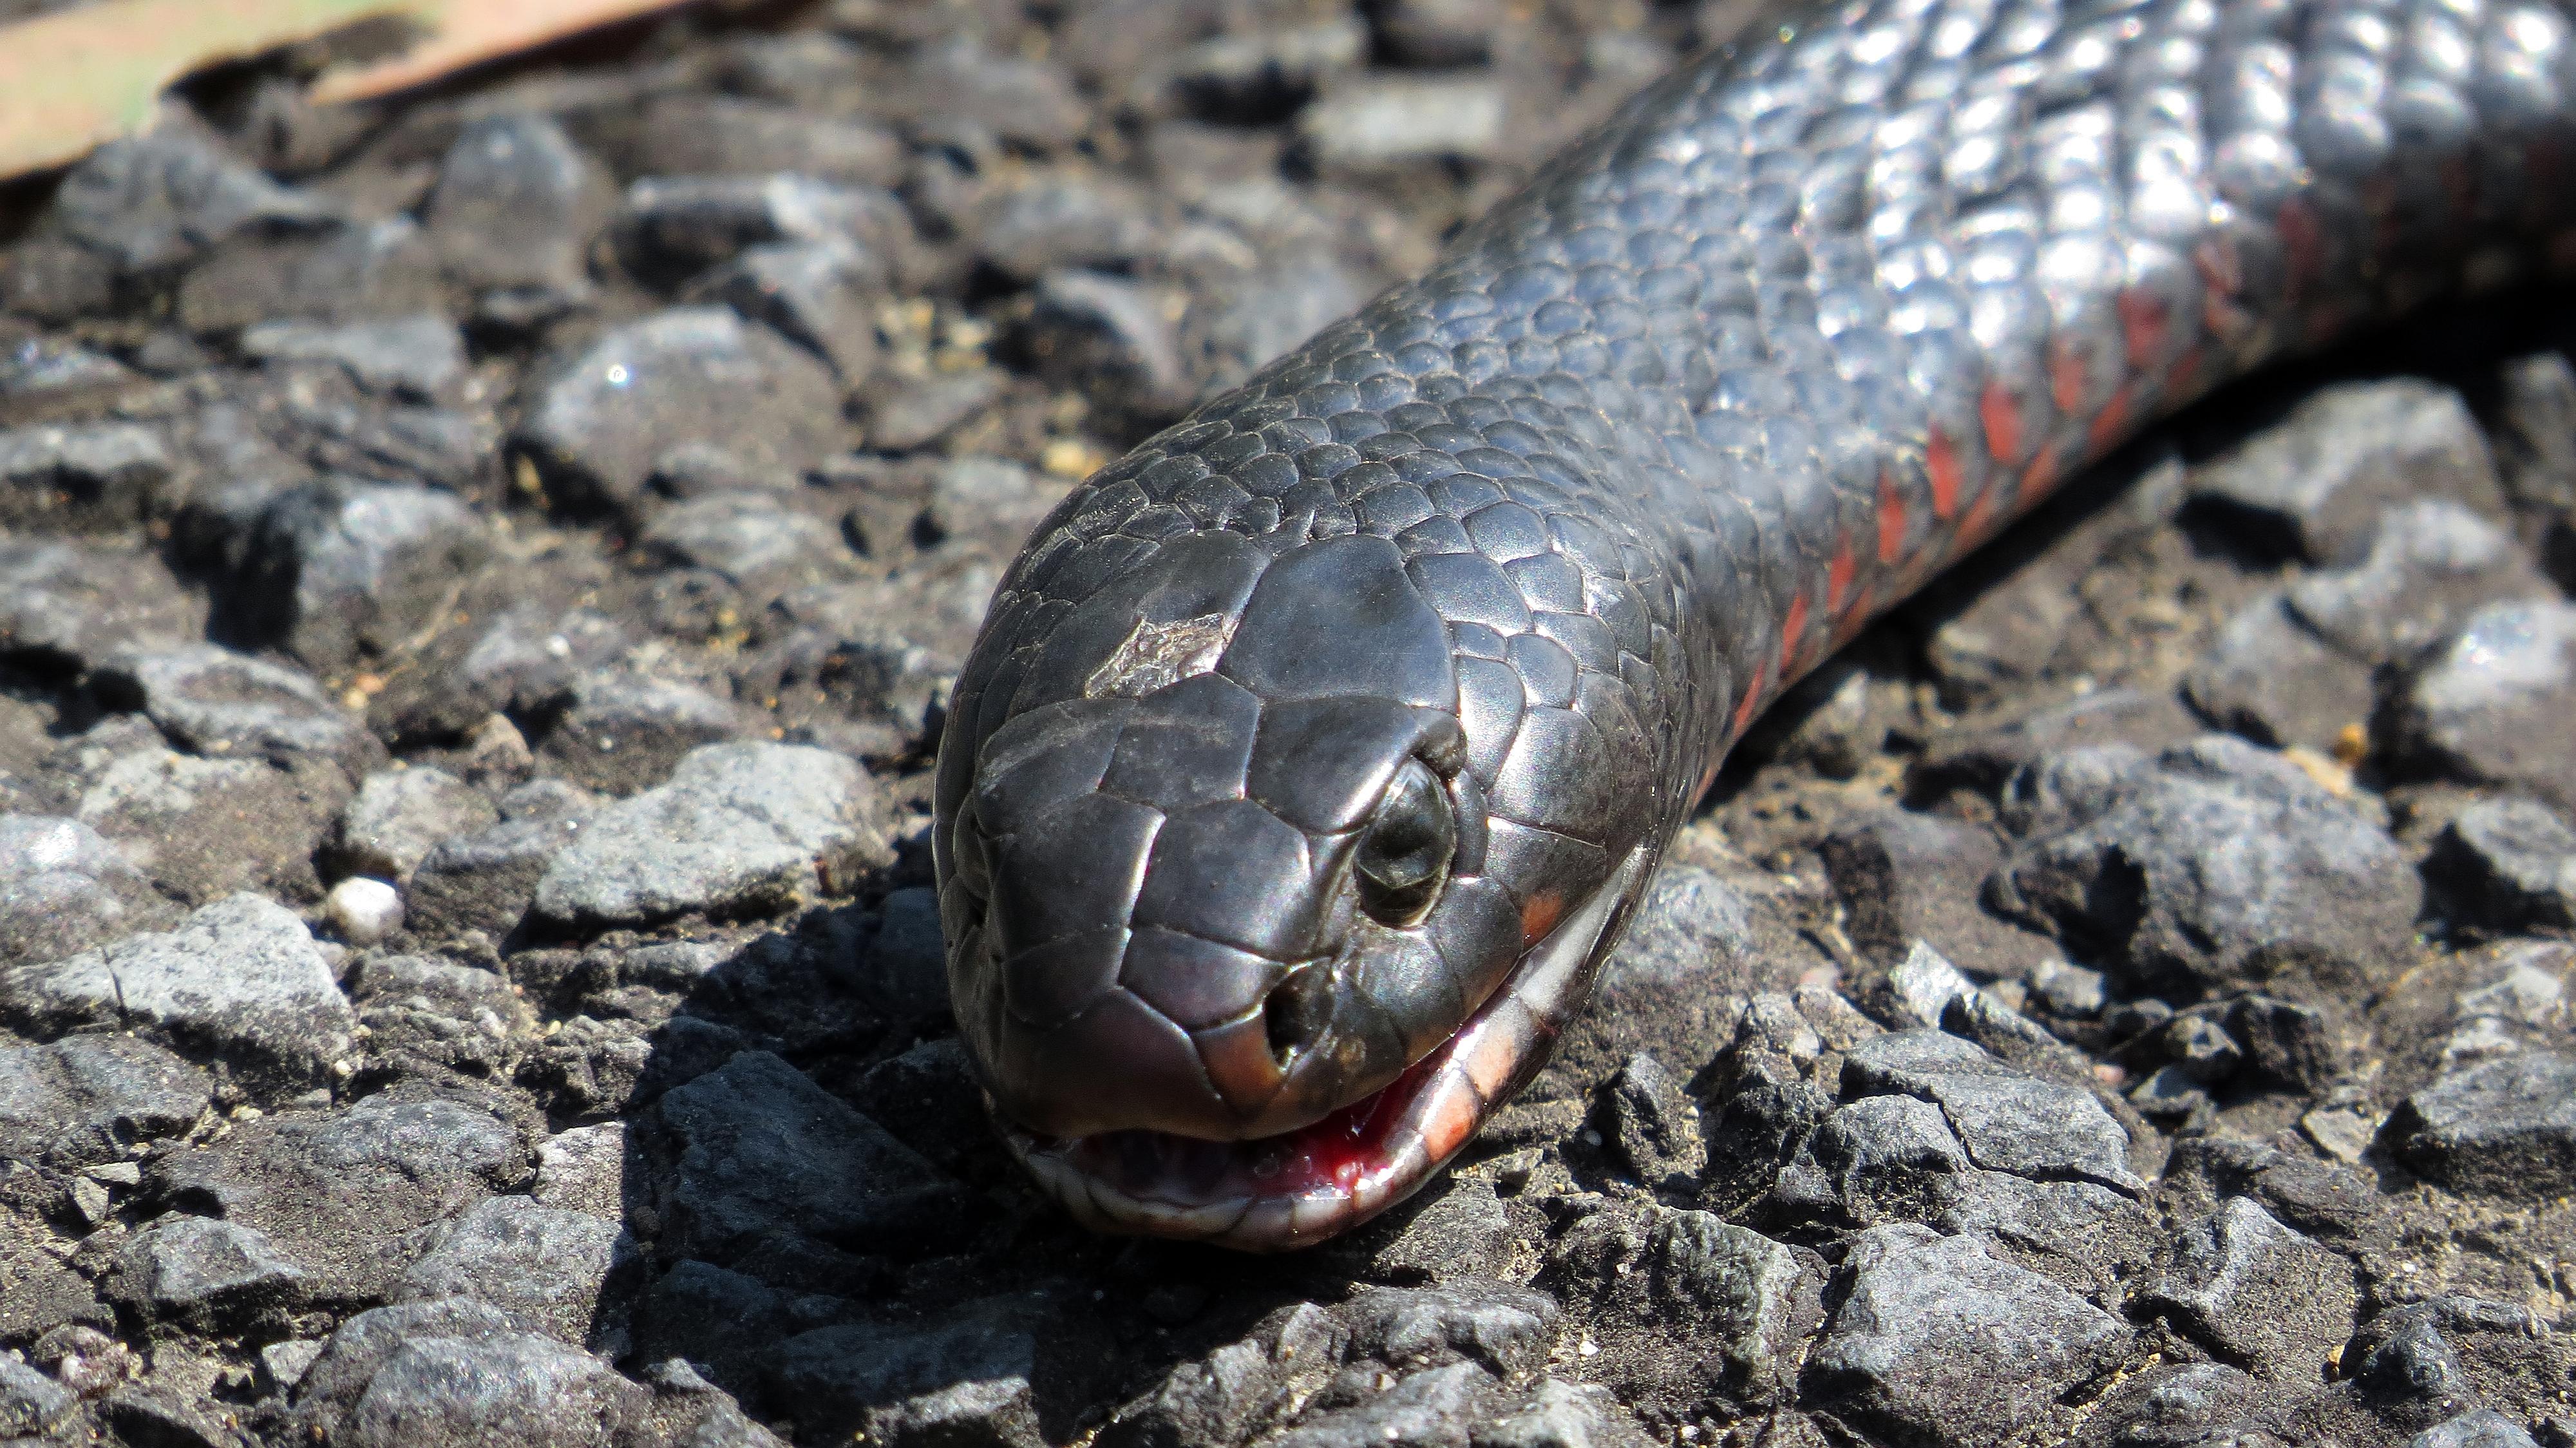 Red-bellied Black Snake svg #9, Download drawings